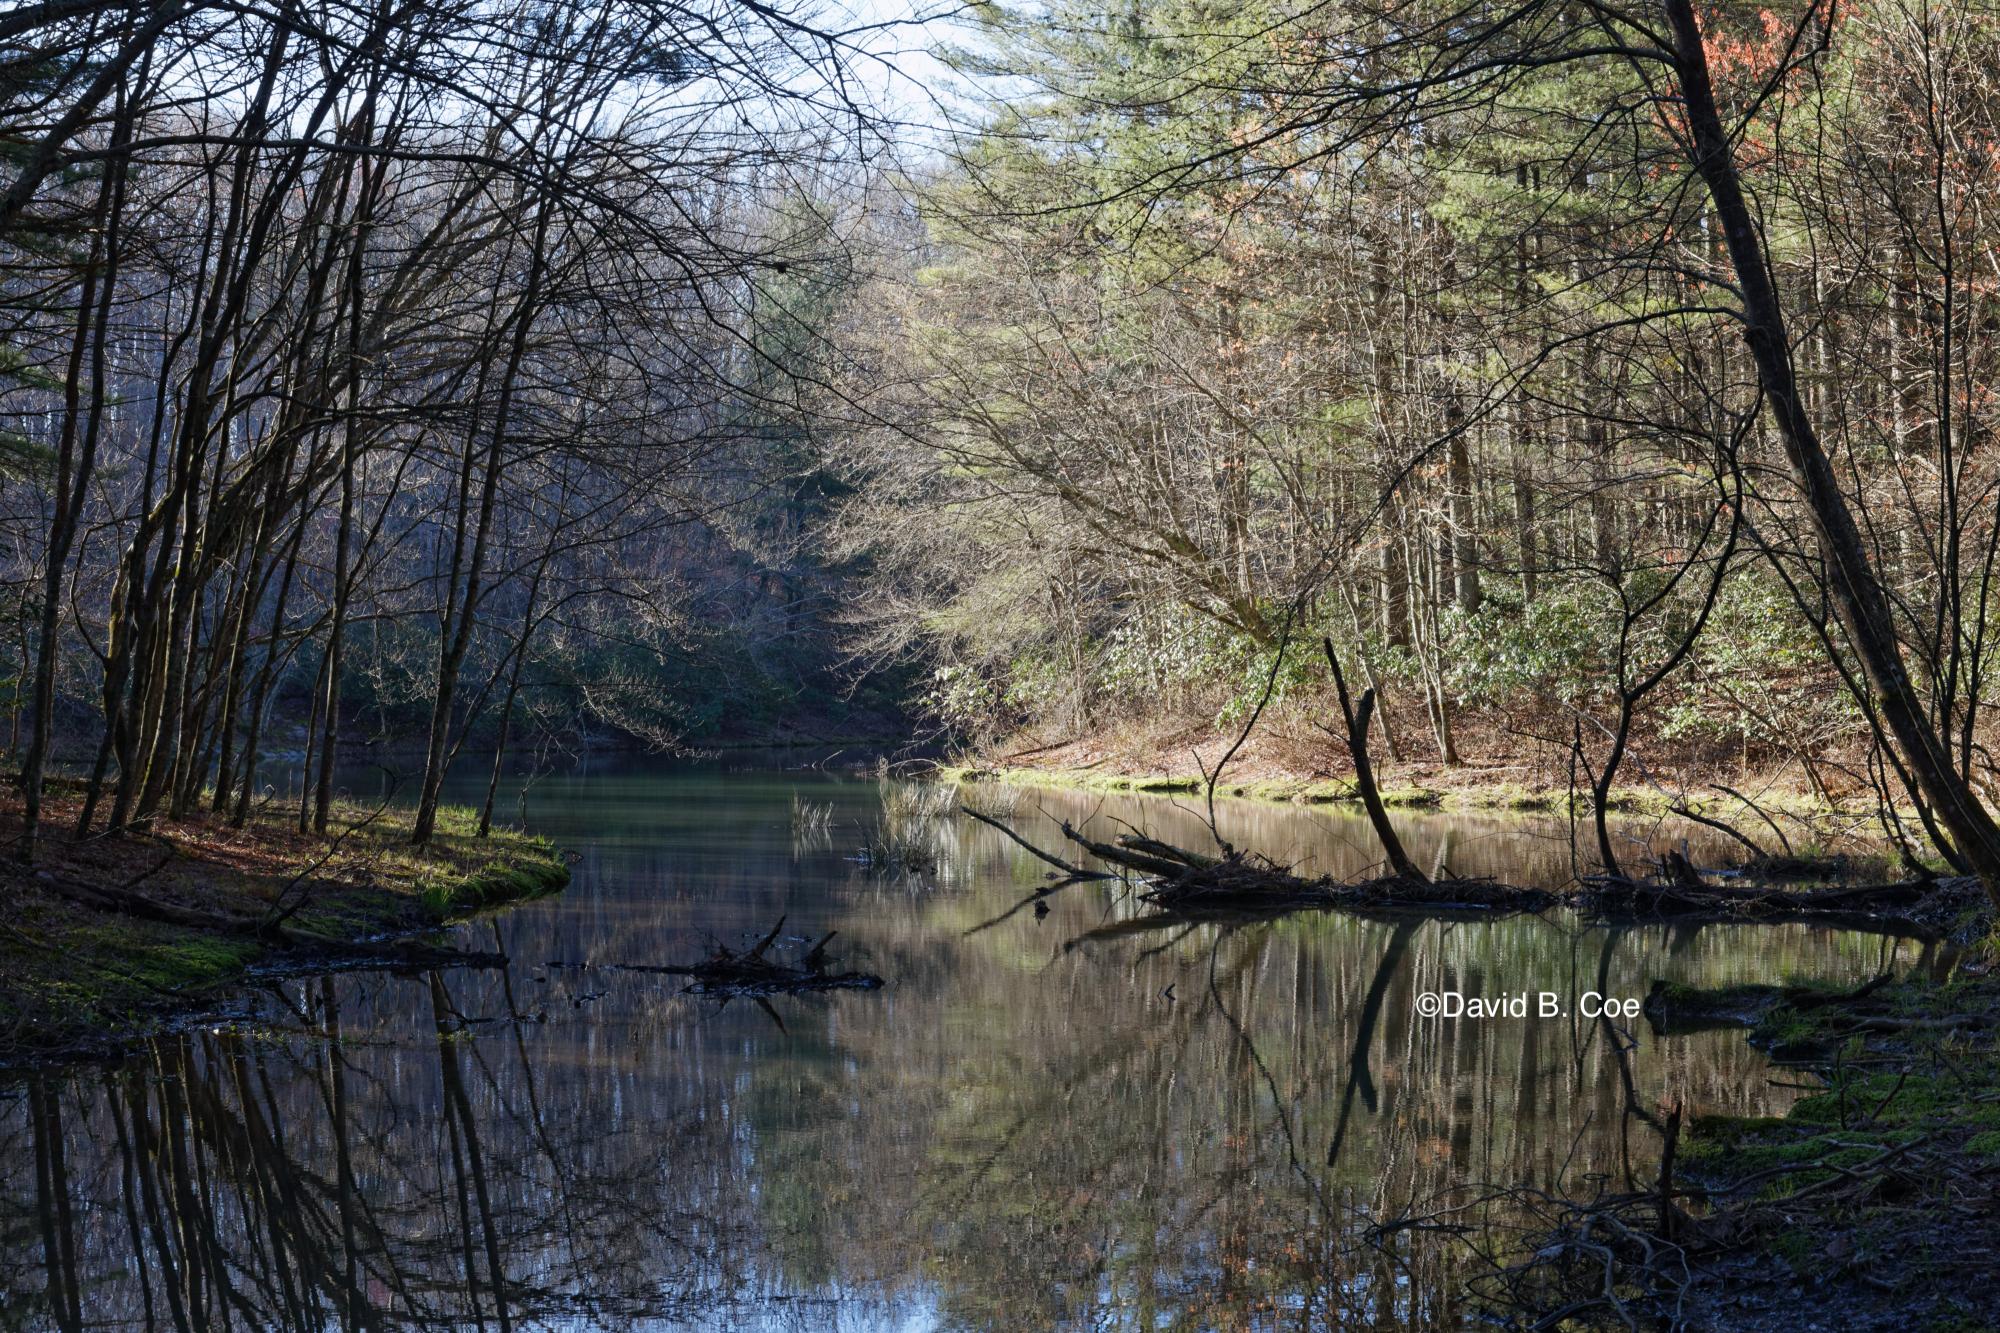 Jackson Lake, Early Spring, by David B. Coe